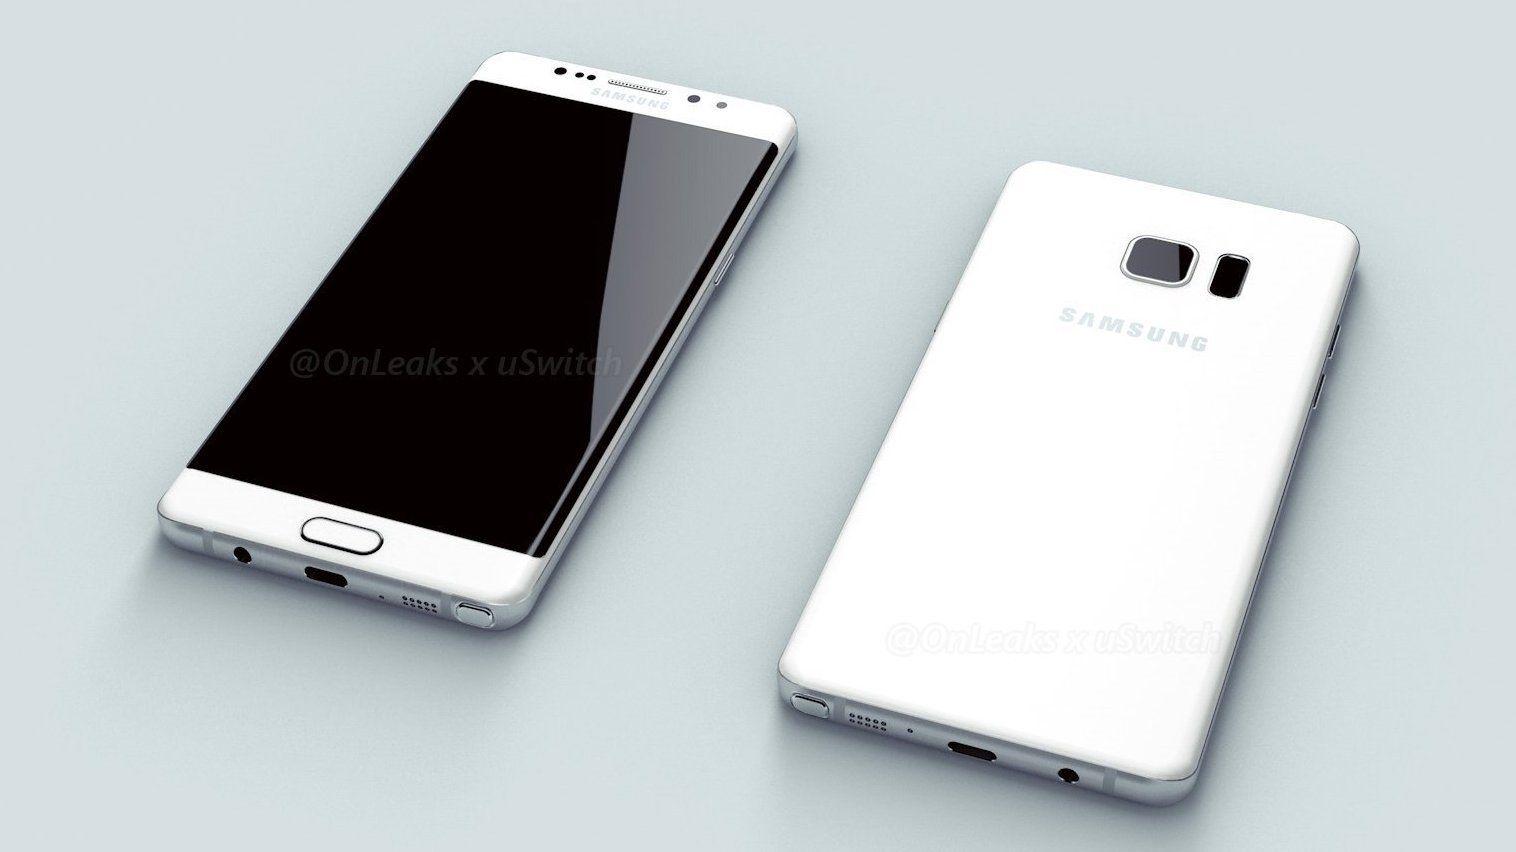 Slik ser angivelig Samsungs enorme Galaxy Note 6 ut